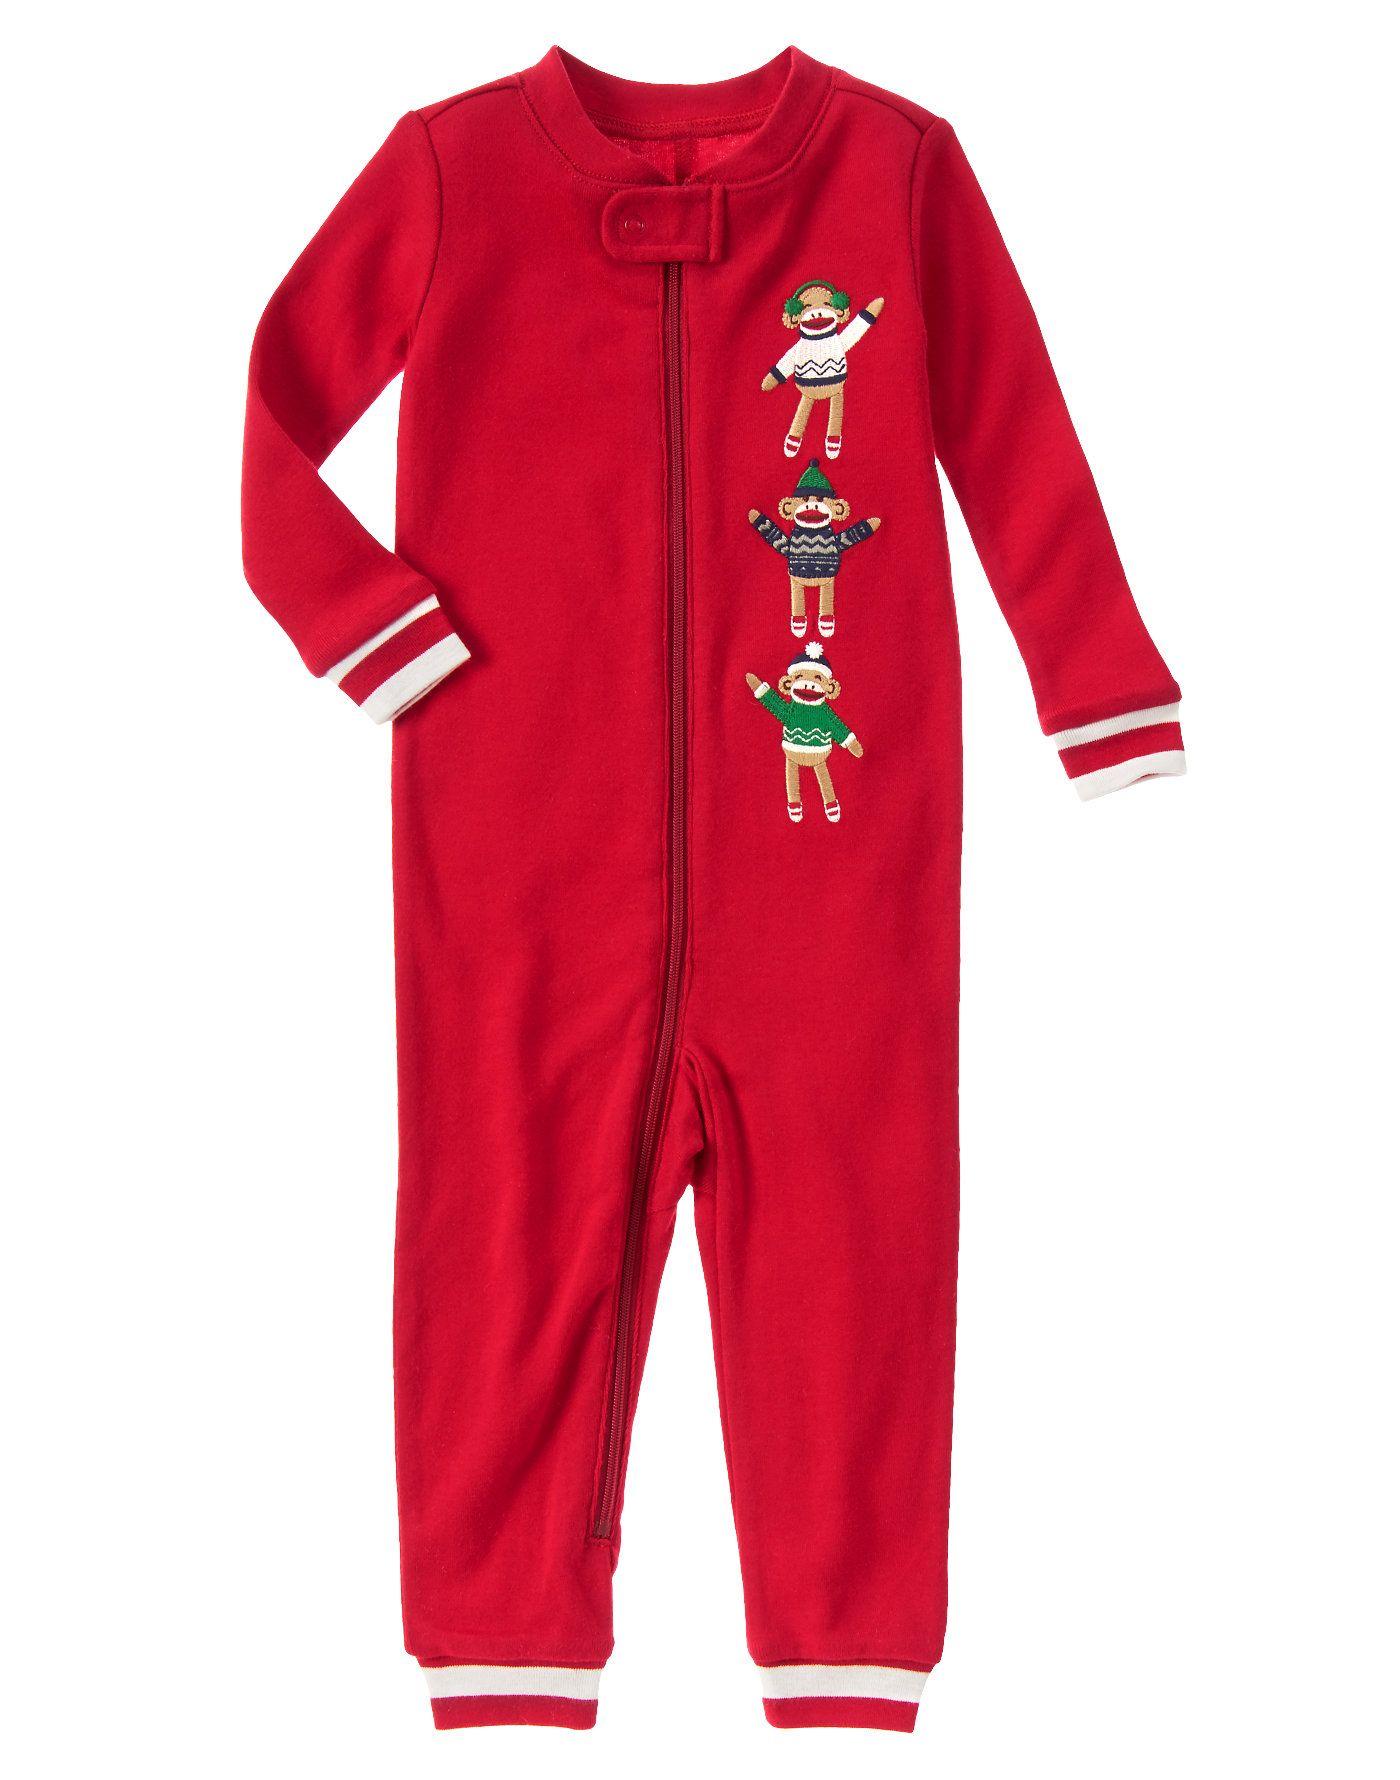 66e96fbaac Babies · Sock Monkey One-Piece Pajamas at Gymboree